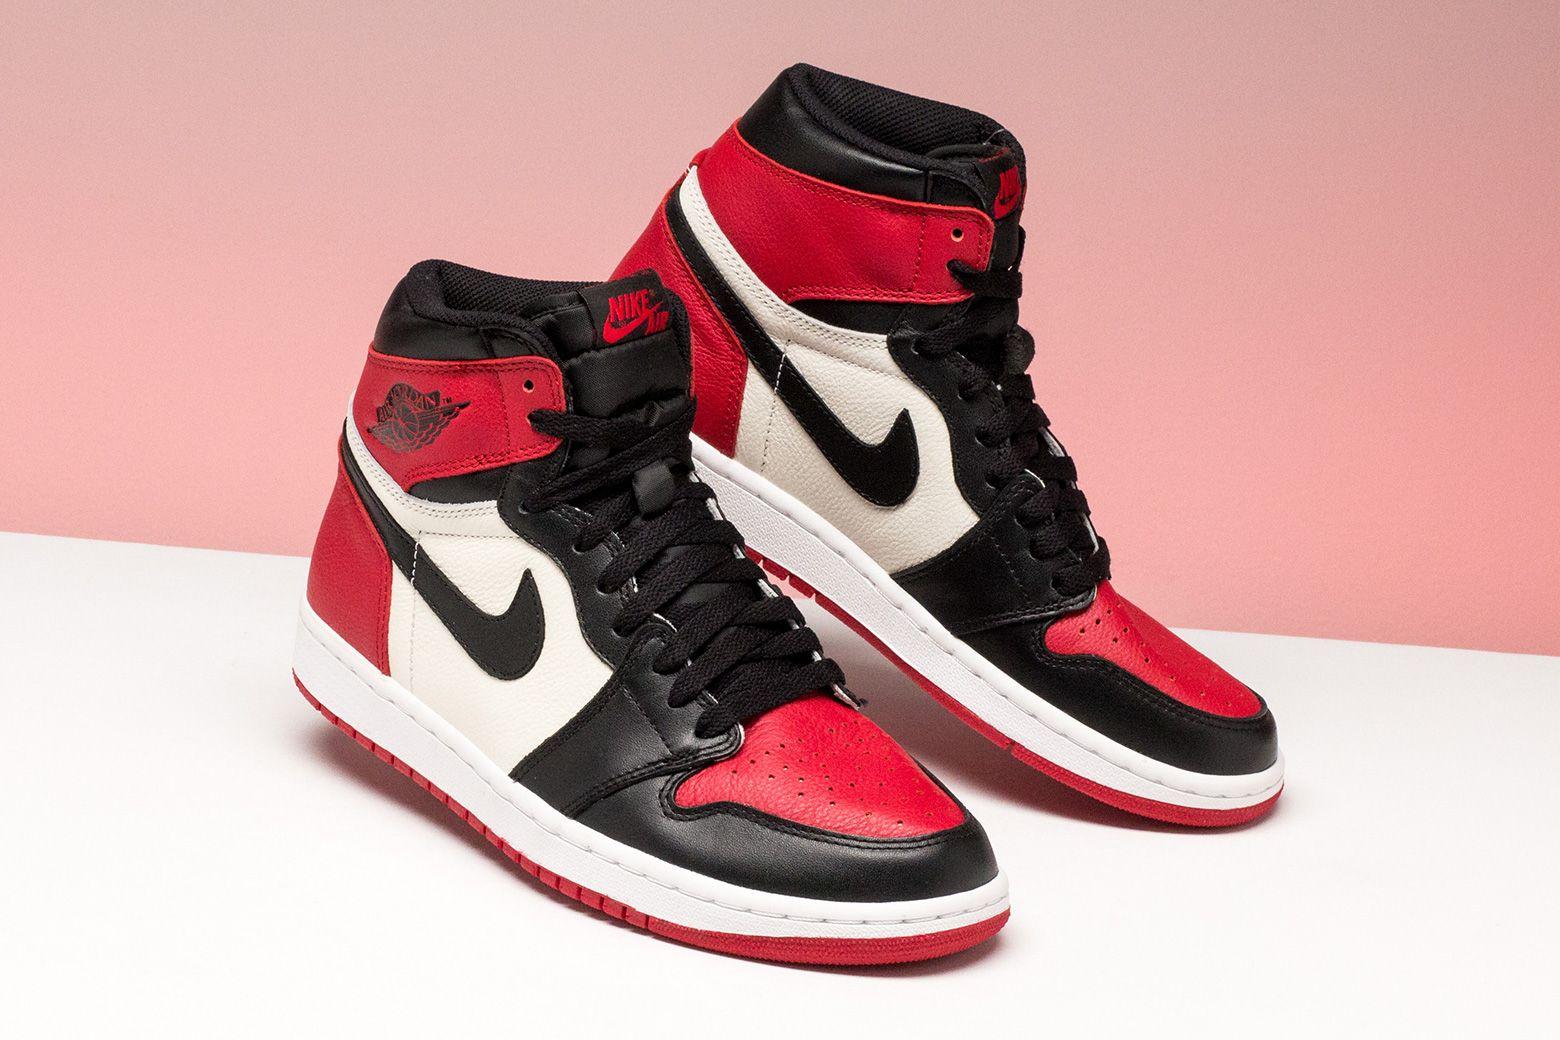 Jordan 1 Retro High Bred Toe 555088 610 Jordan Shoes Girls Fresh Shoes Nike Air Shoes